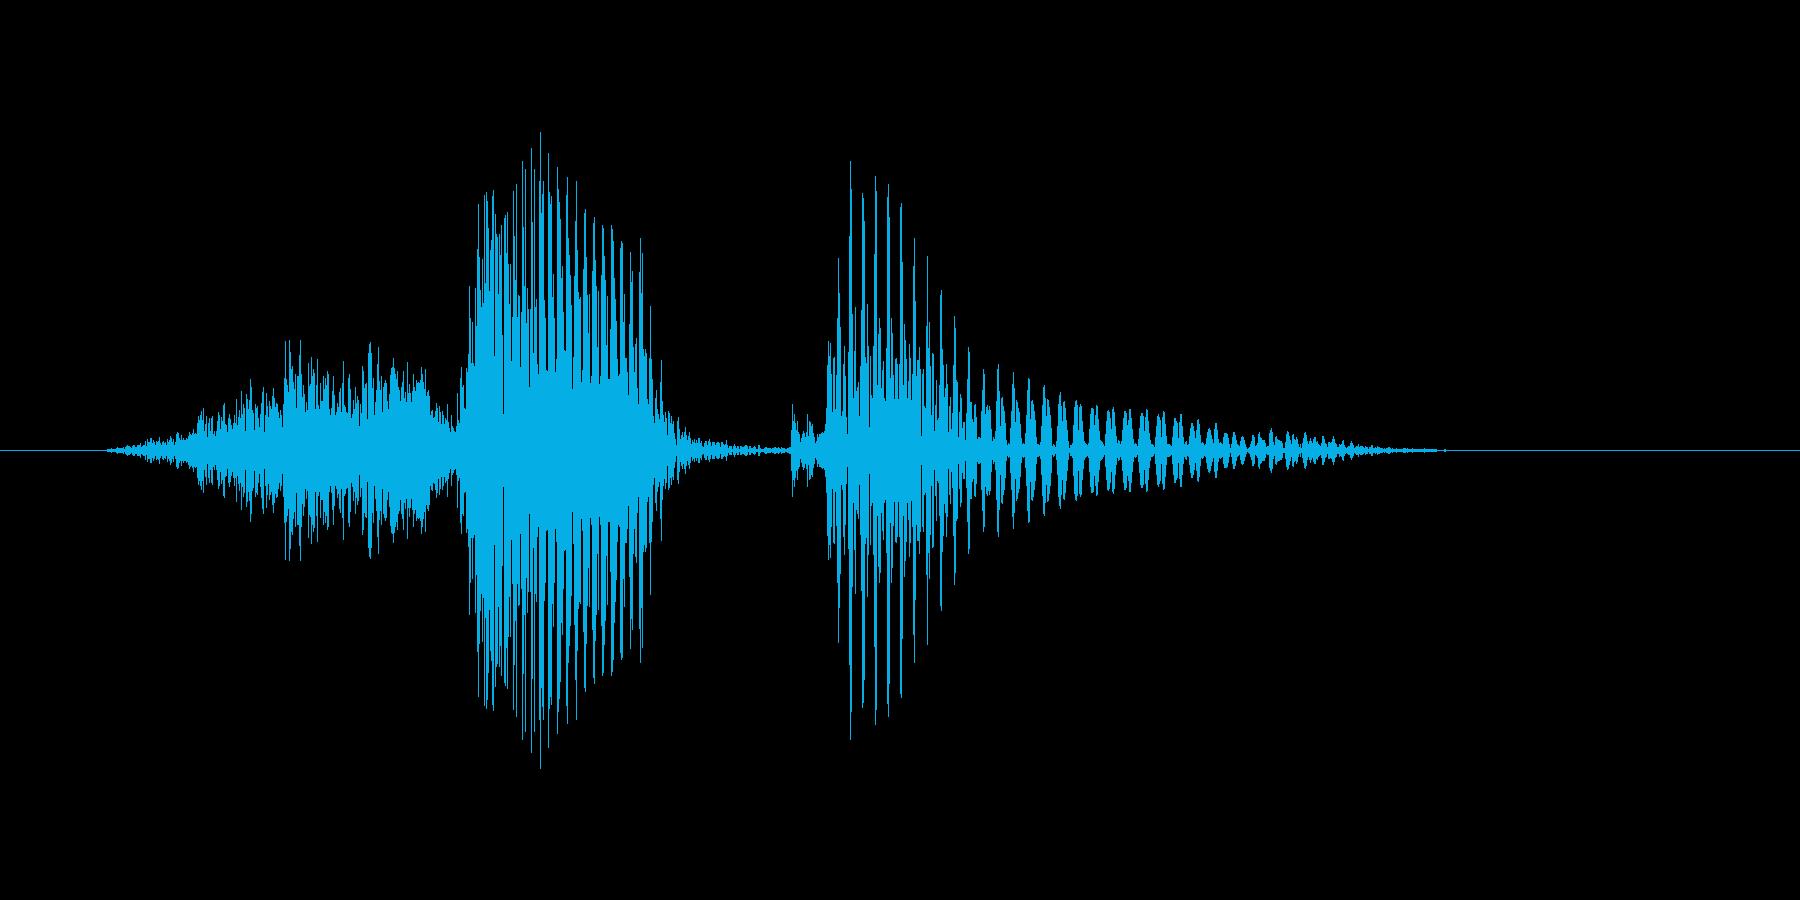 Second(セカンド)の再生済みの波形